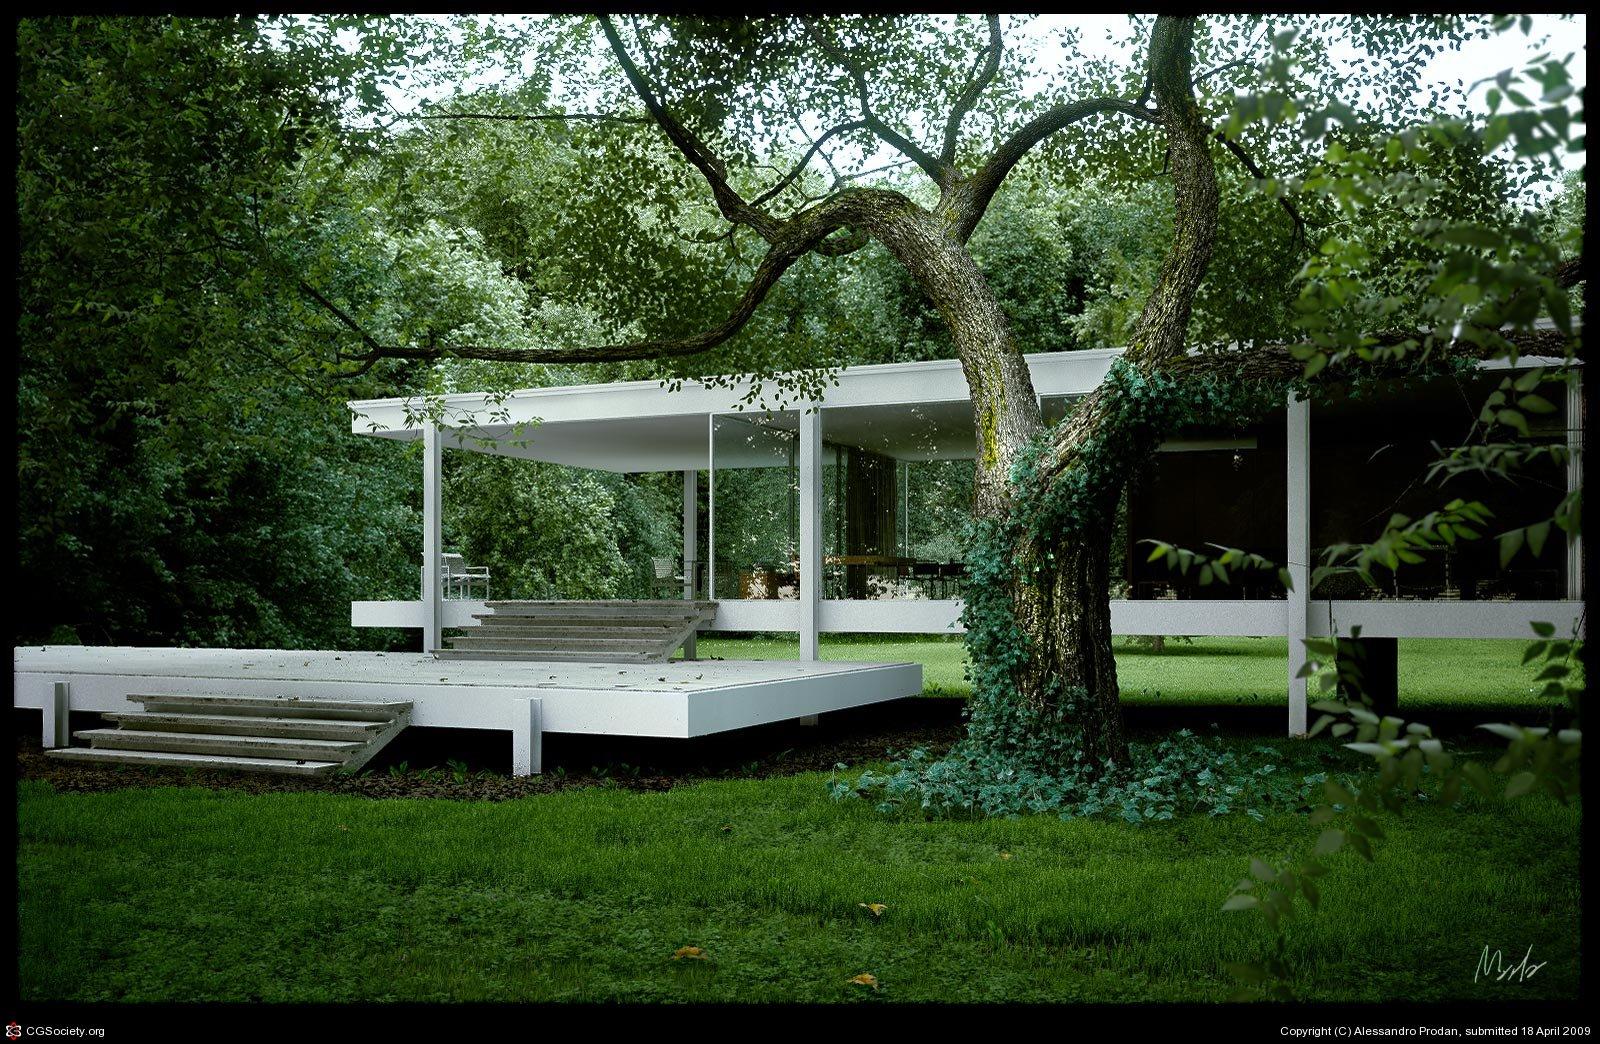 in defense of form follows function mc digital the blog. Black Bedroom Furniture Sets. Home Design Ideas